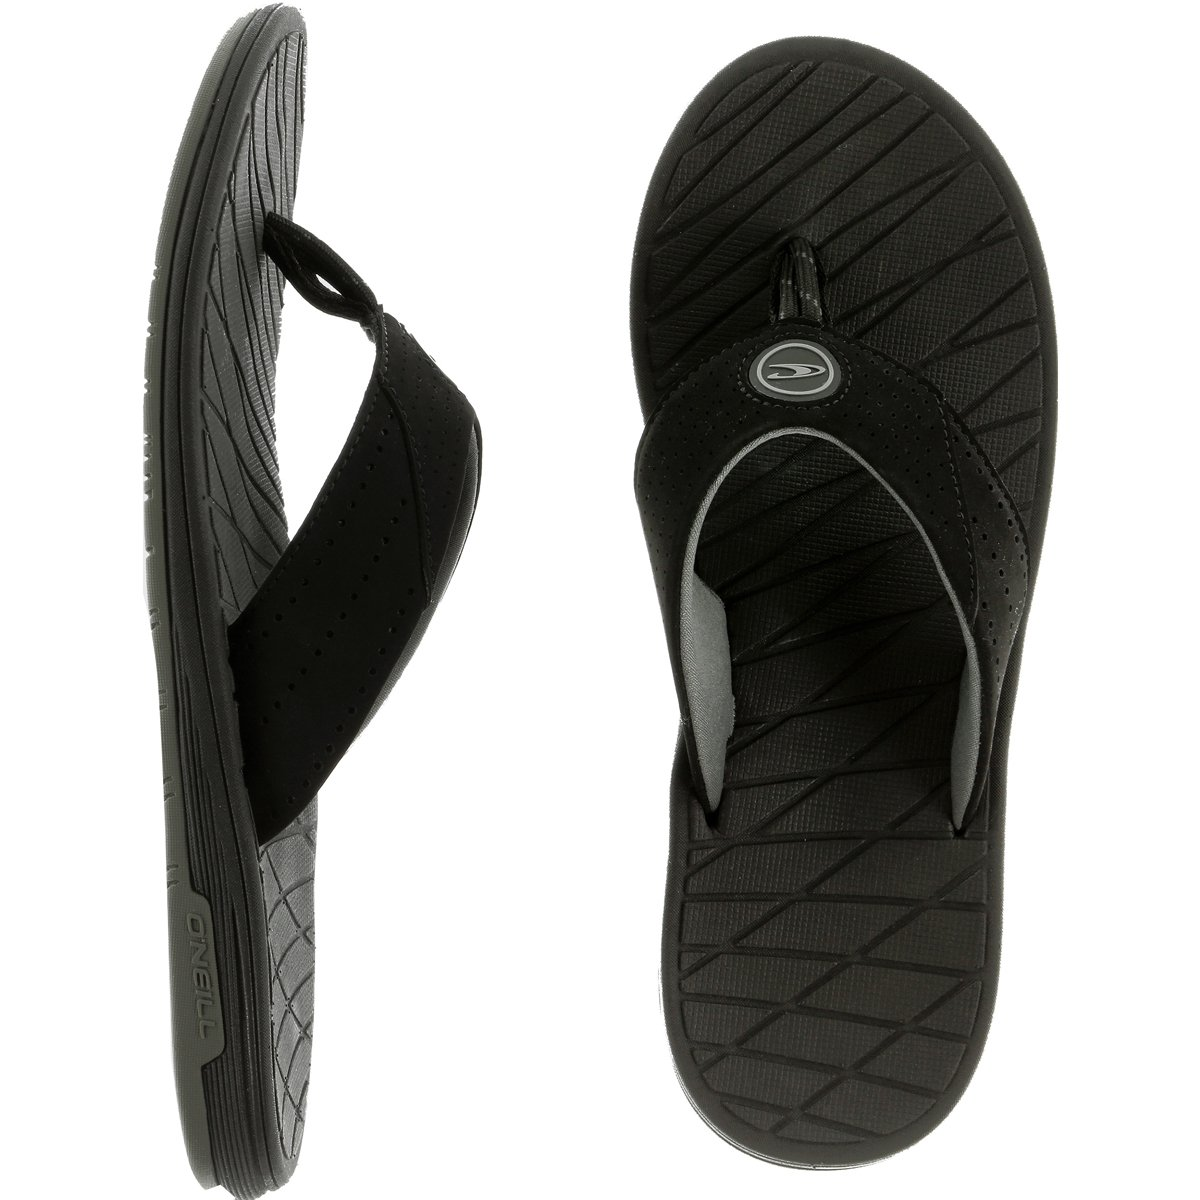 O'Neill Men's Traveler Sandal Flip Flop, Black/Grey, 9 M US